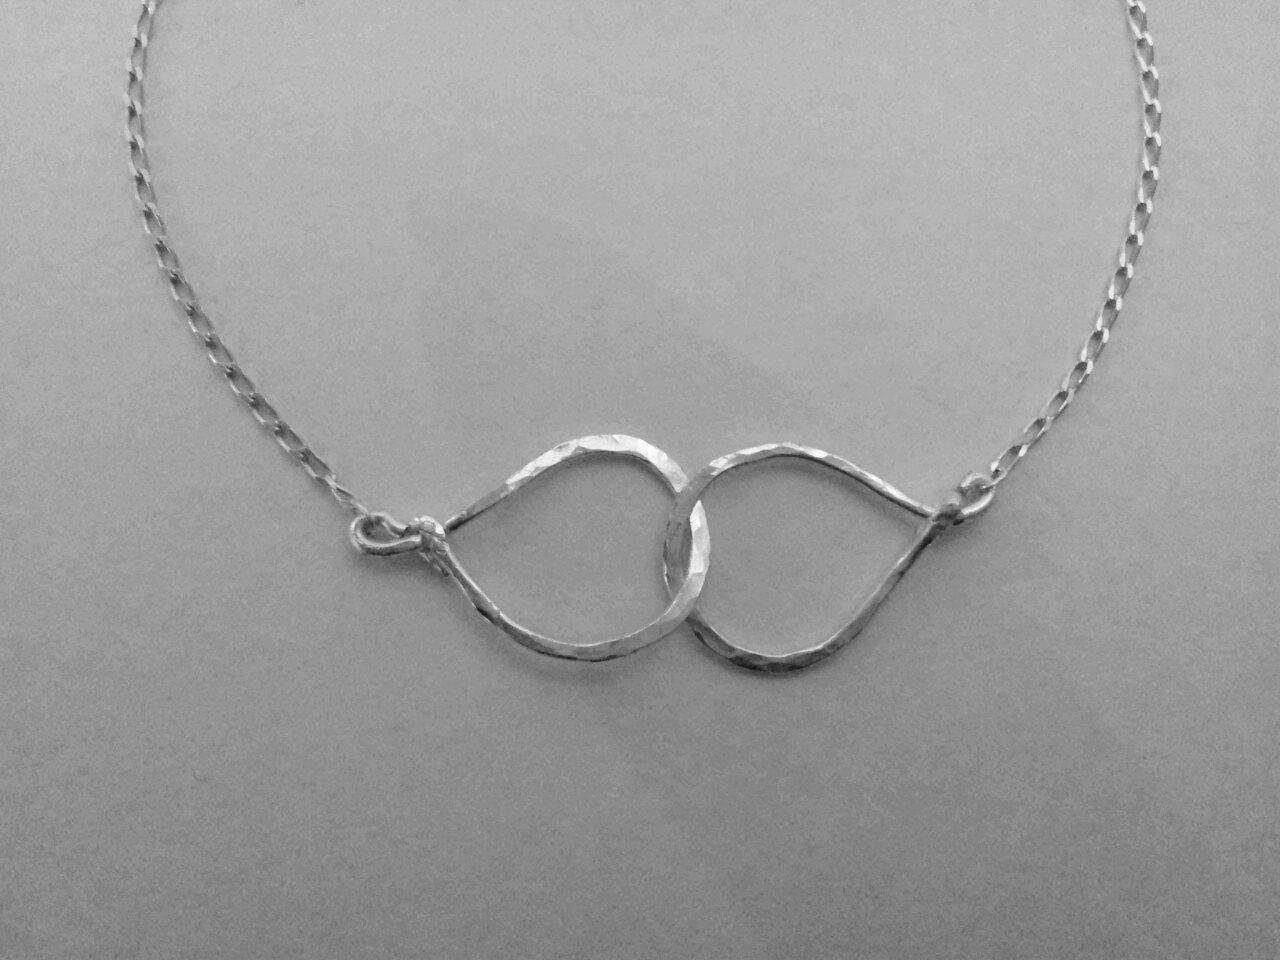 Friendship bracelet silvergold relationship simple bridesmaid